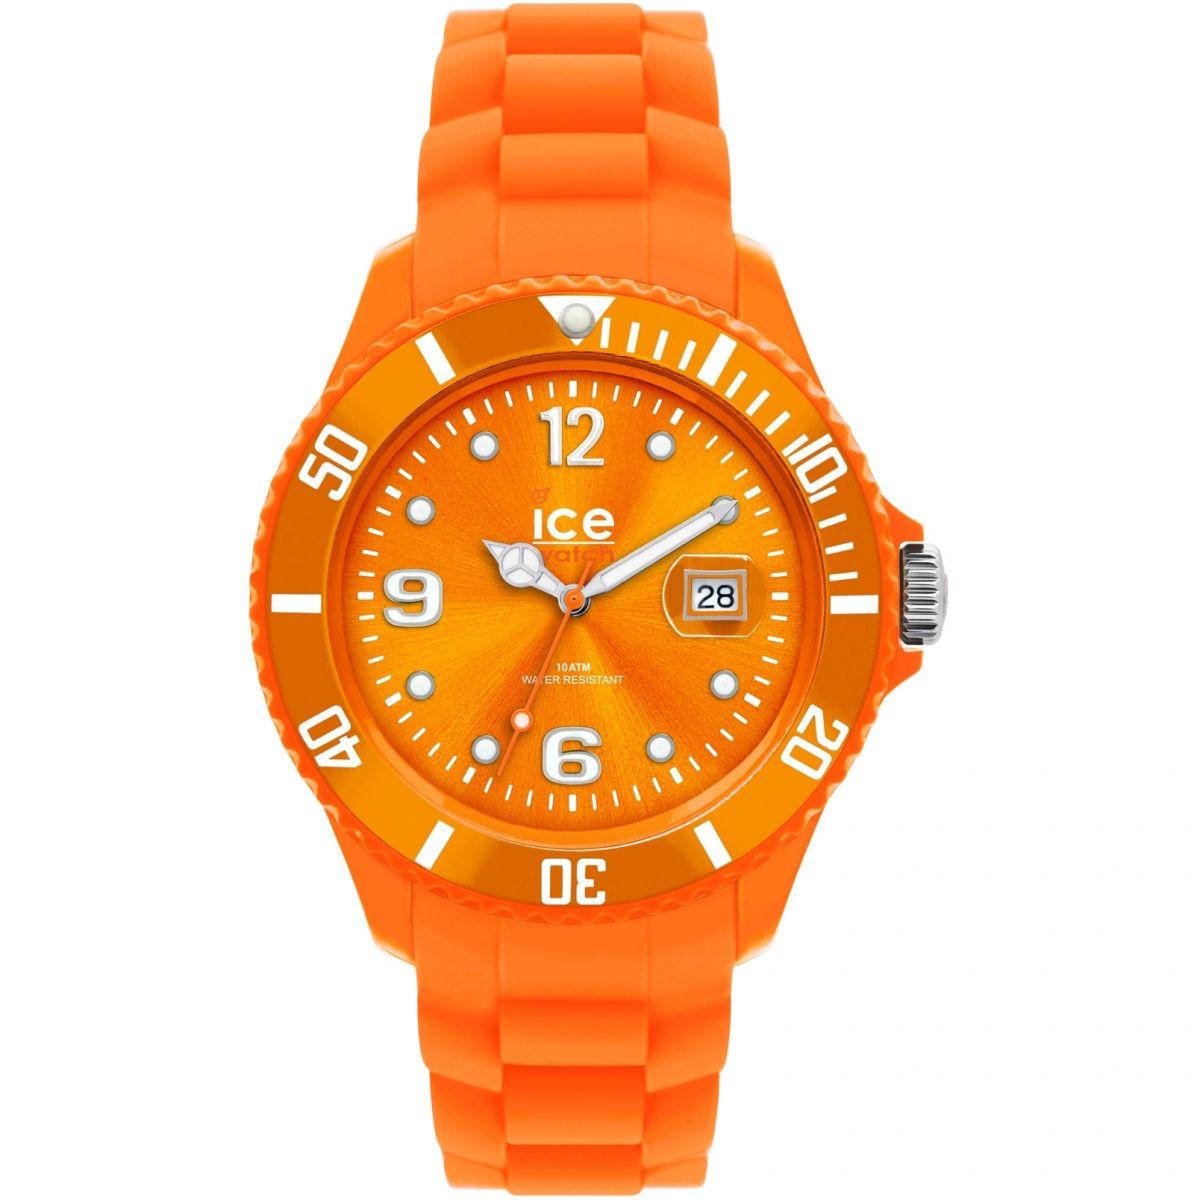 unisexe ice watch sili orange big montre si oe b. Black Bedroom Furniture Sets. Home Design Ideas